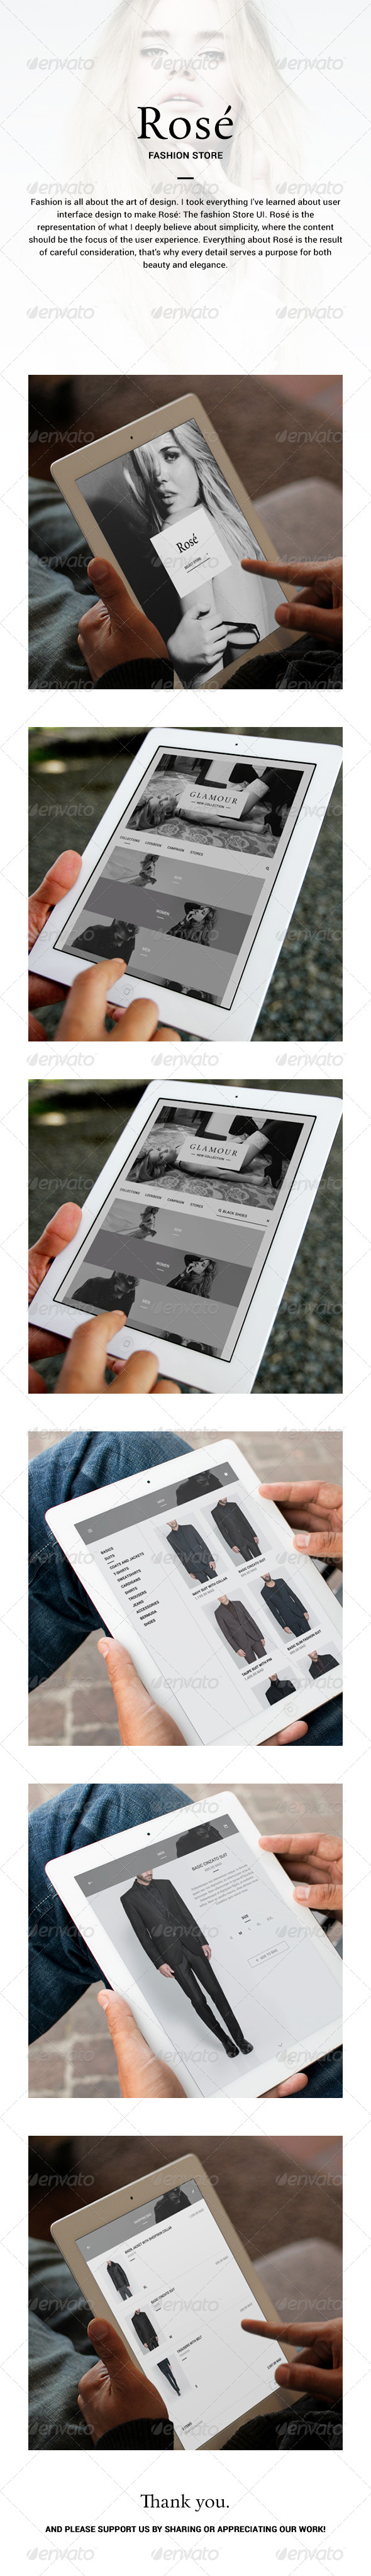 GraphicRiver Fashion Store App Rose 6088321